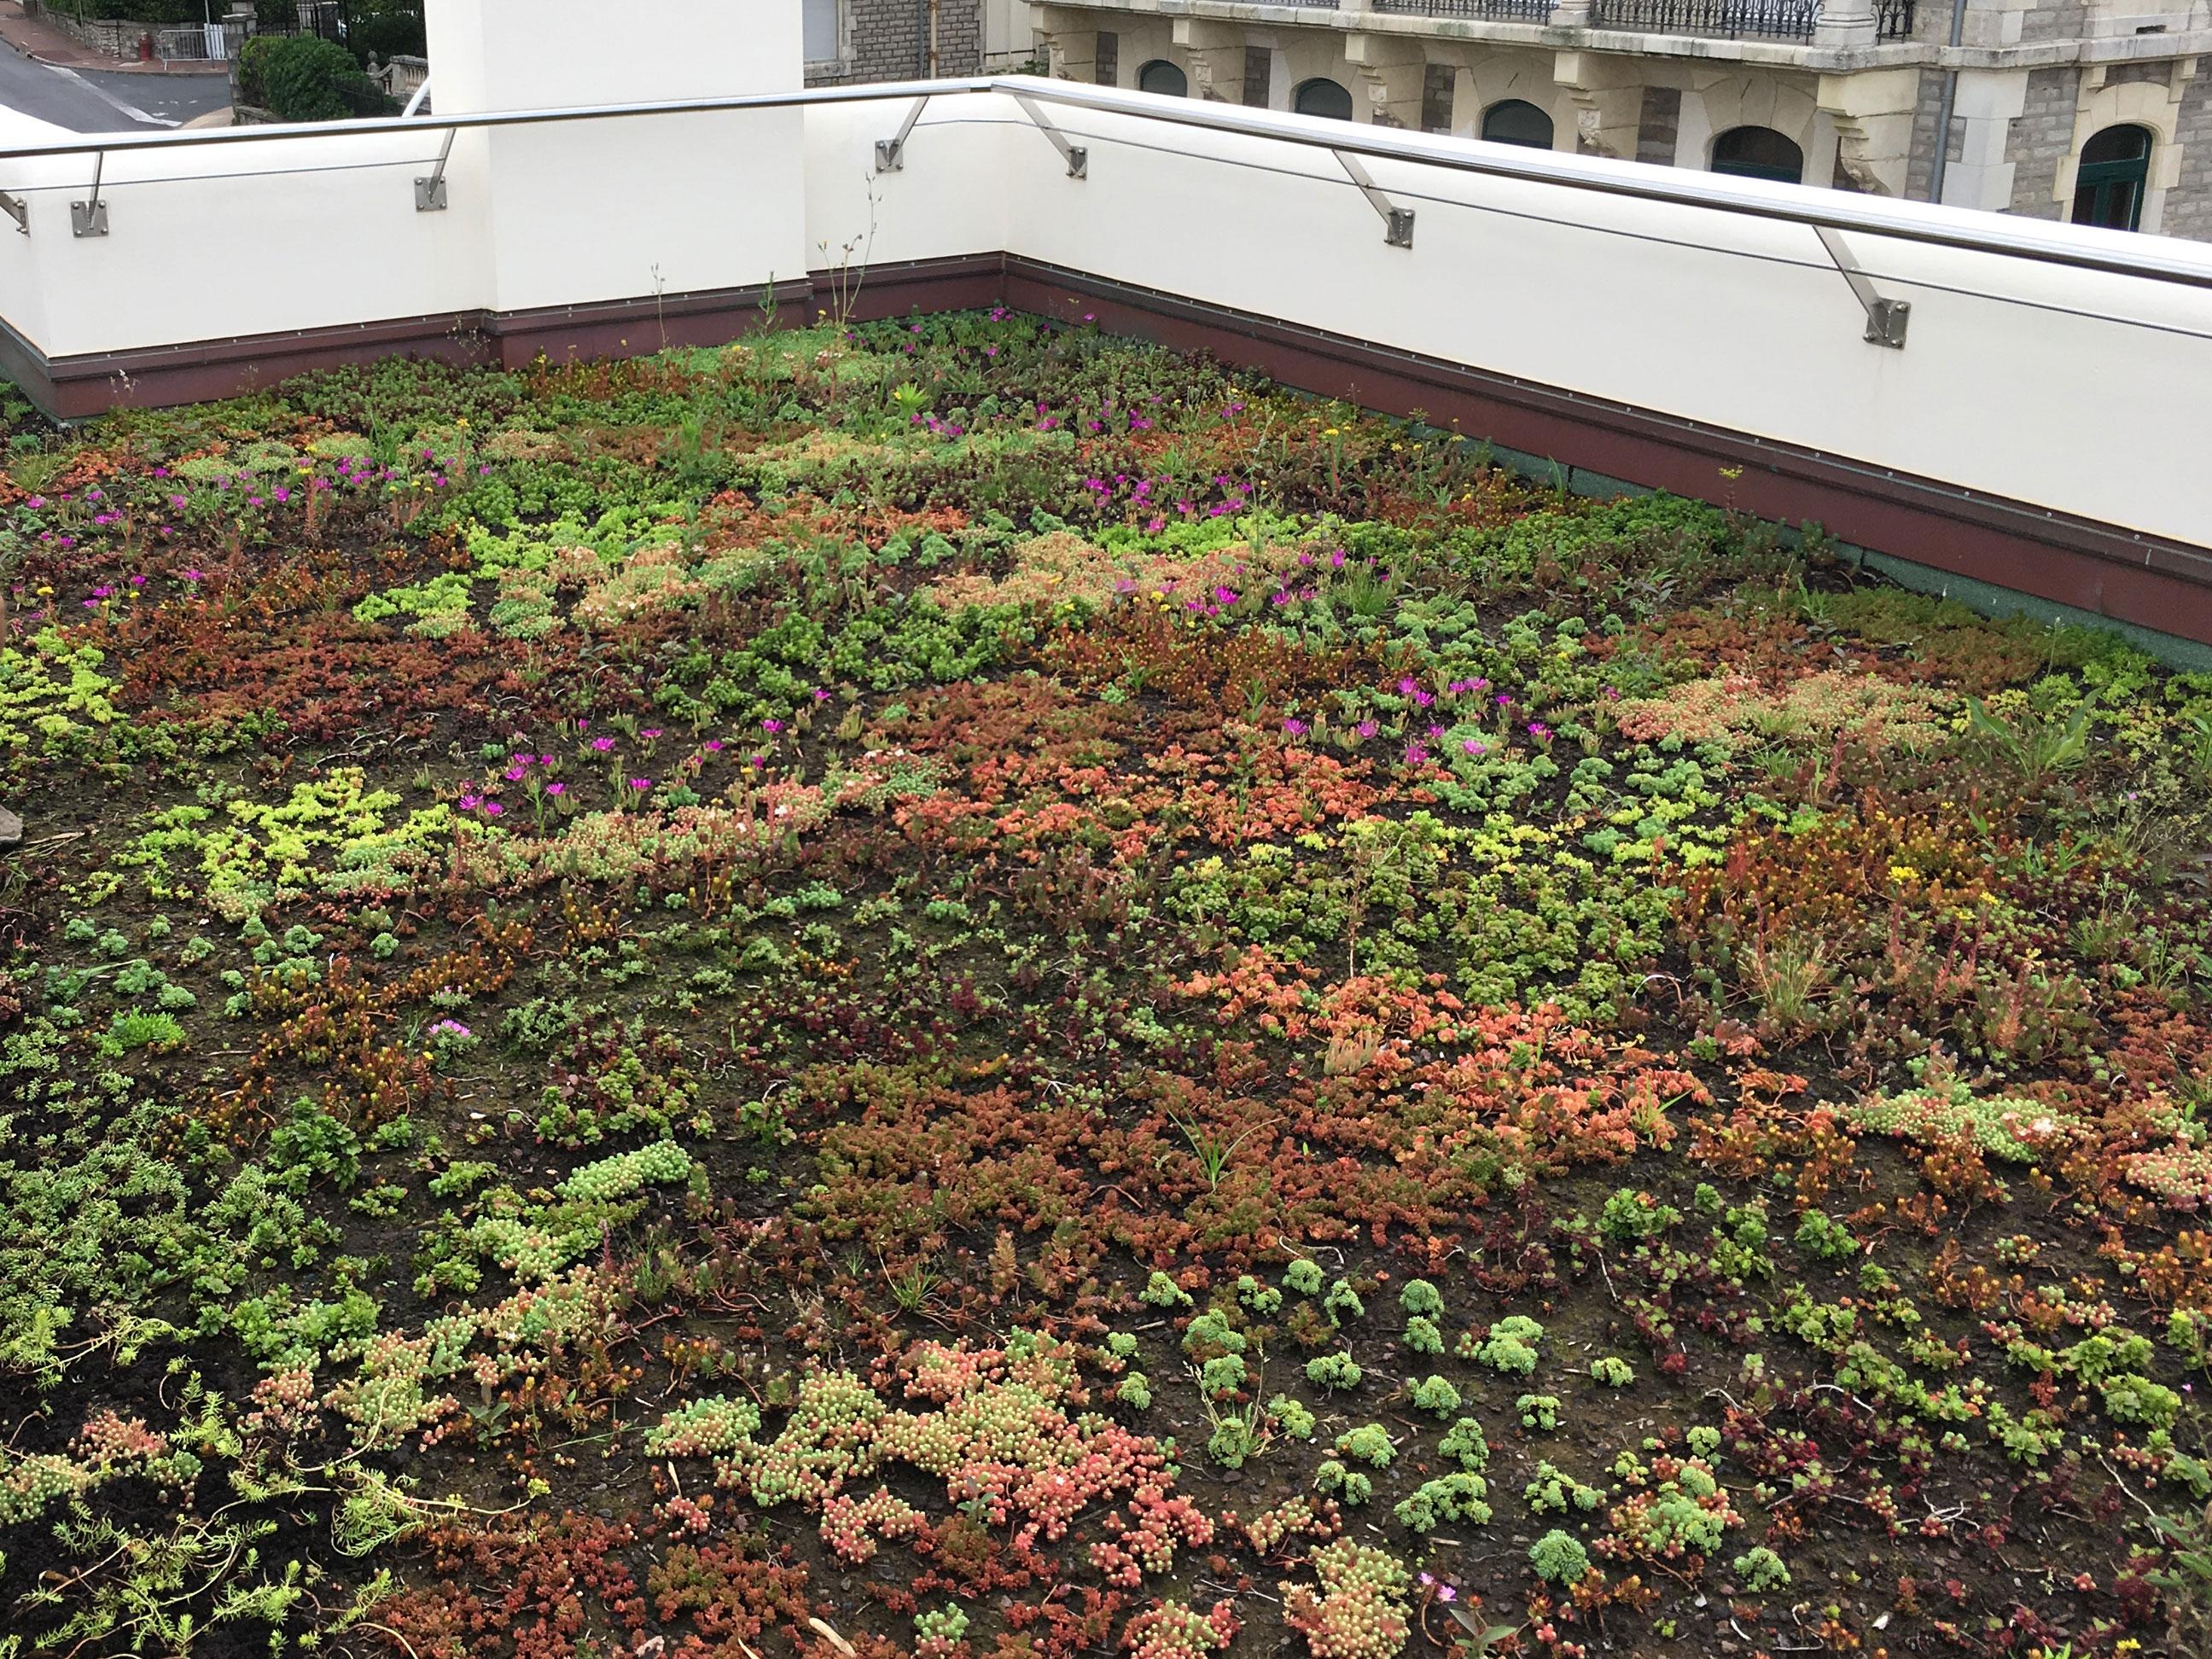 Floriparc, toit terrasse vegetalisée Biarritz